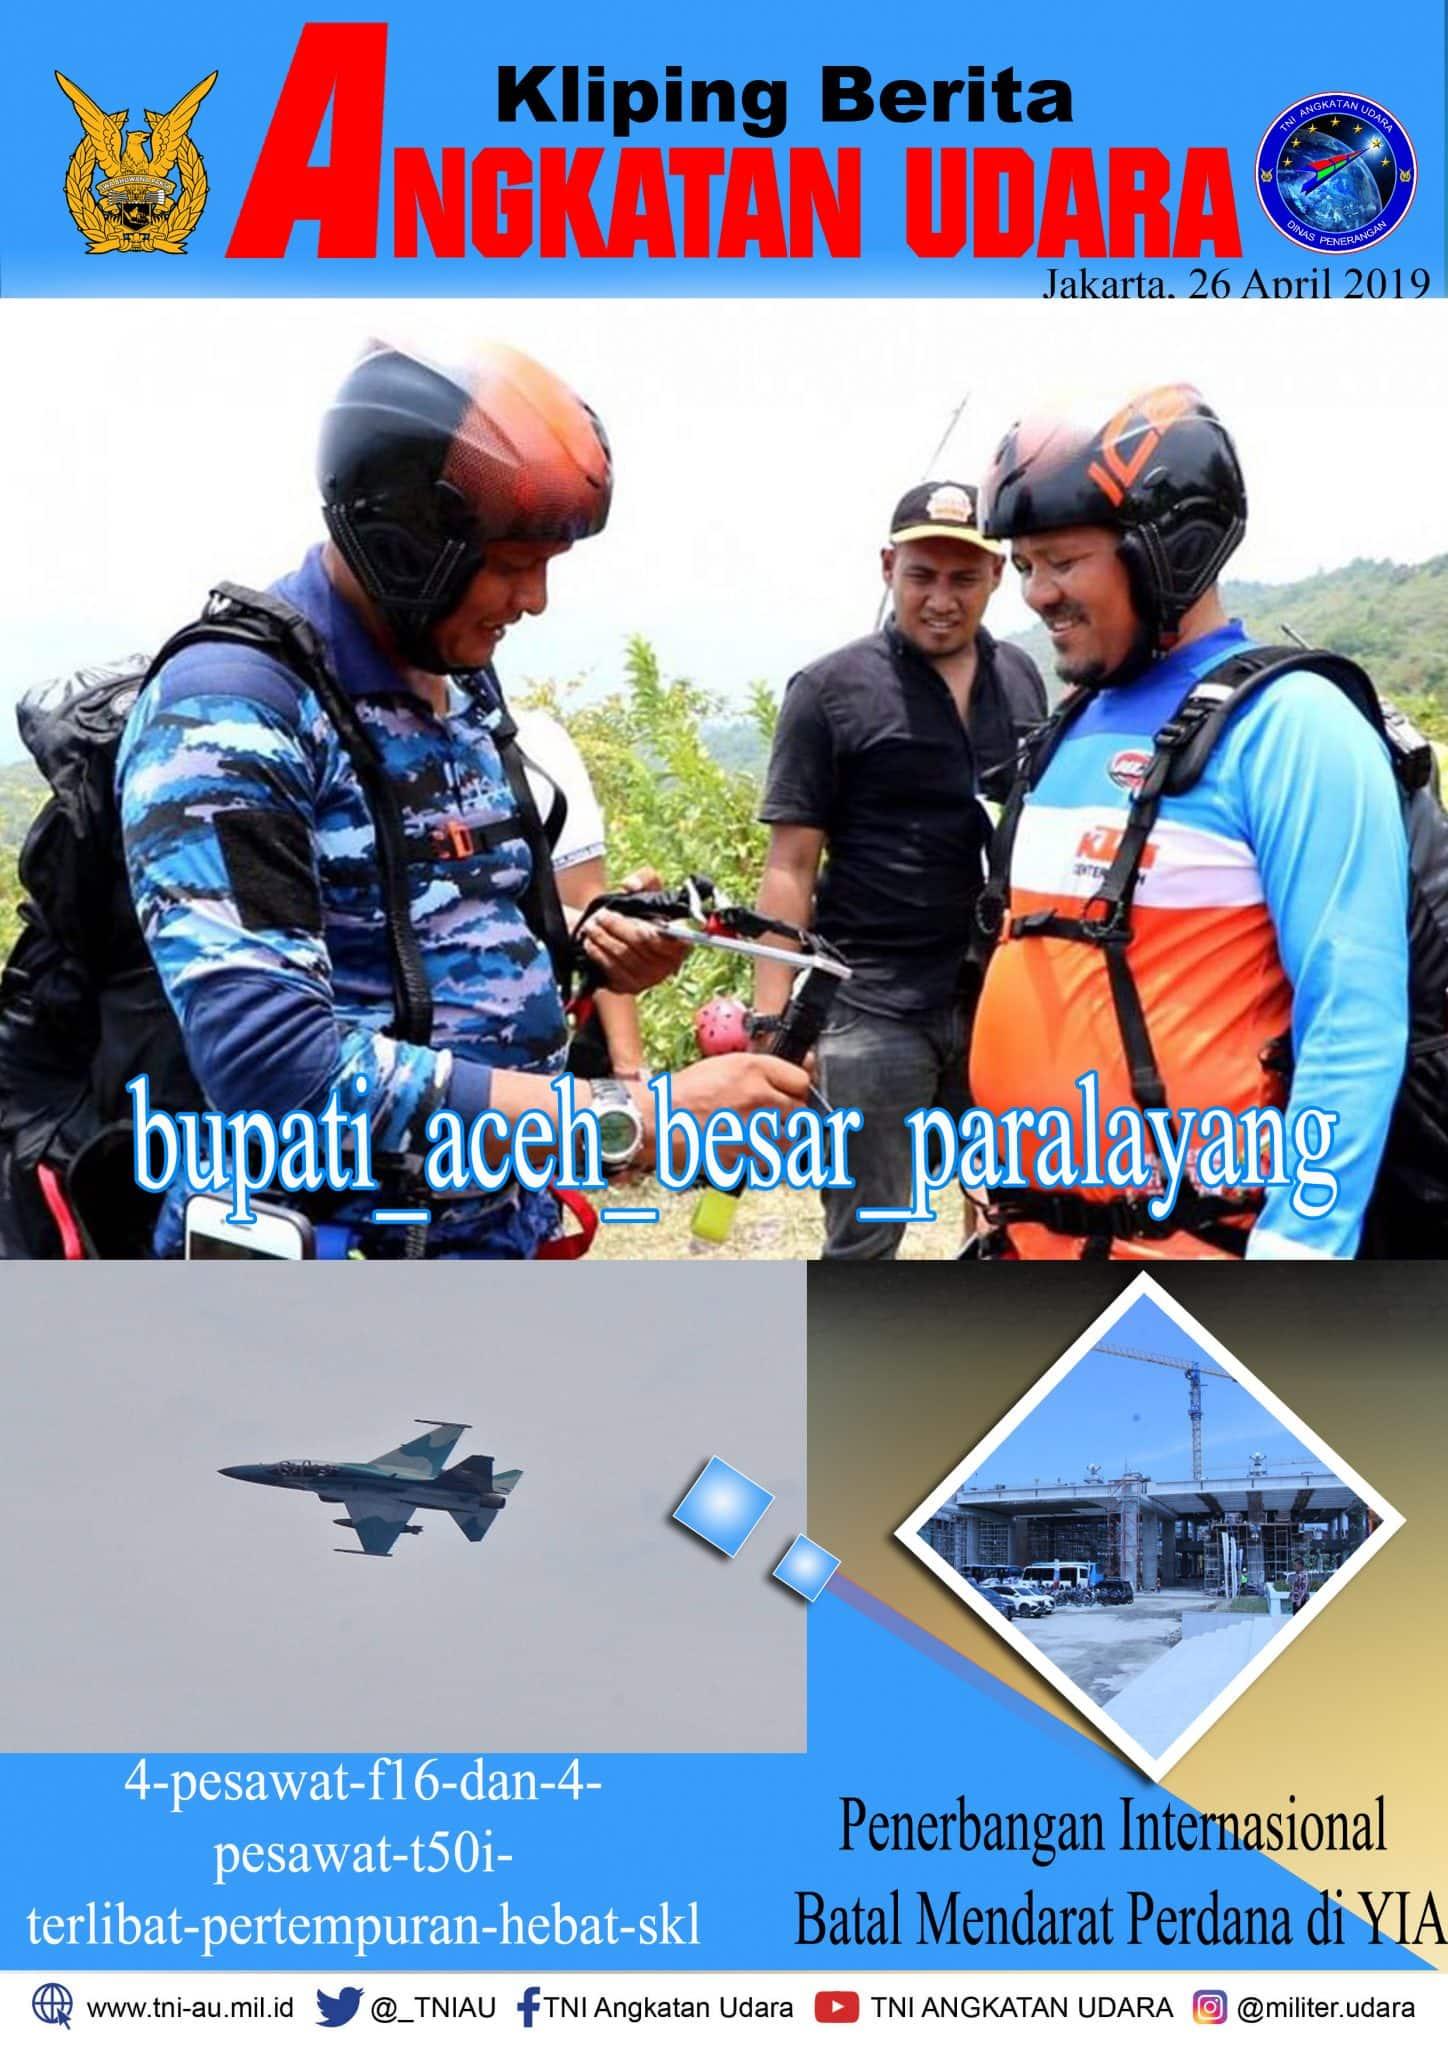 Kliping Berita Media 26 April 2019